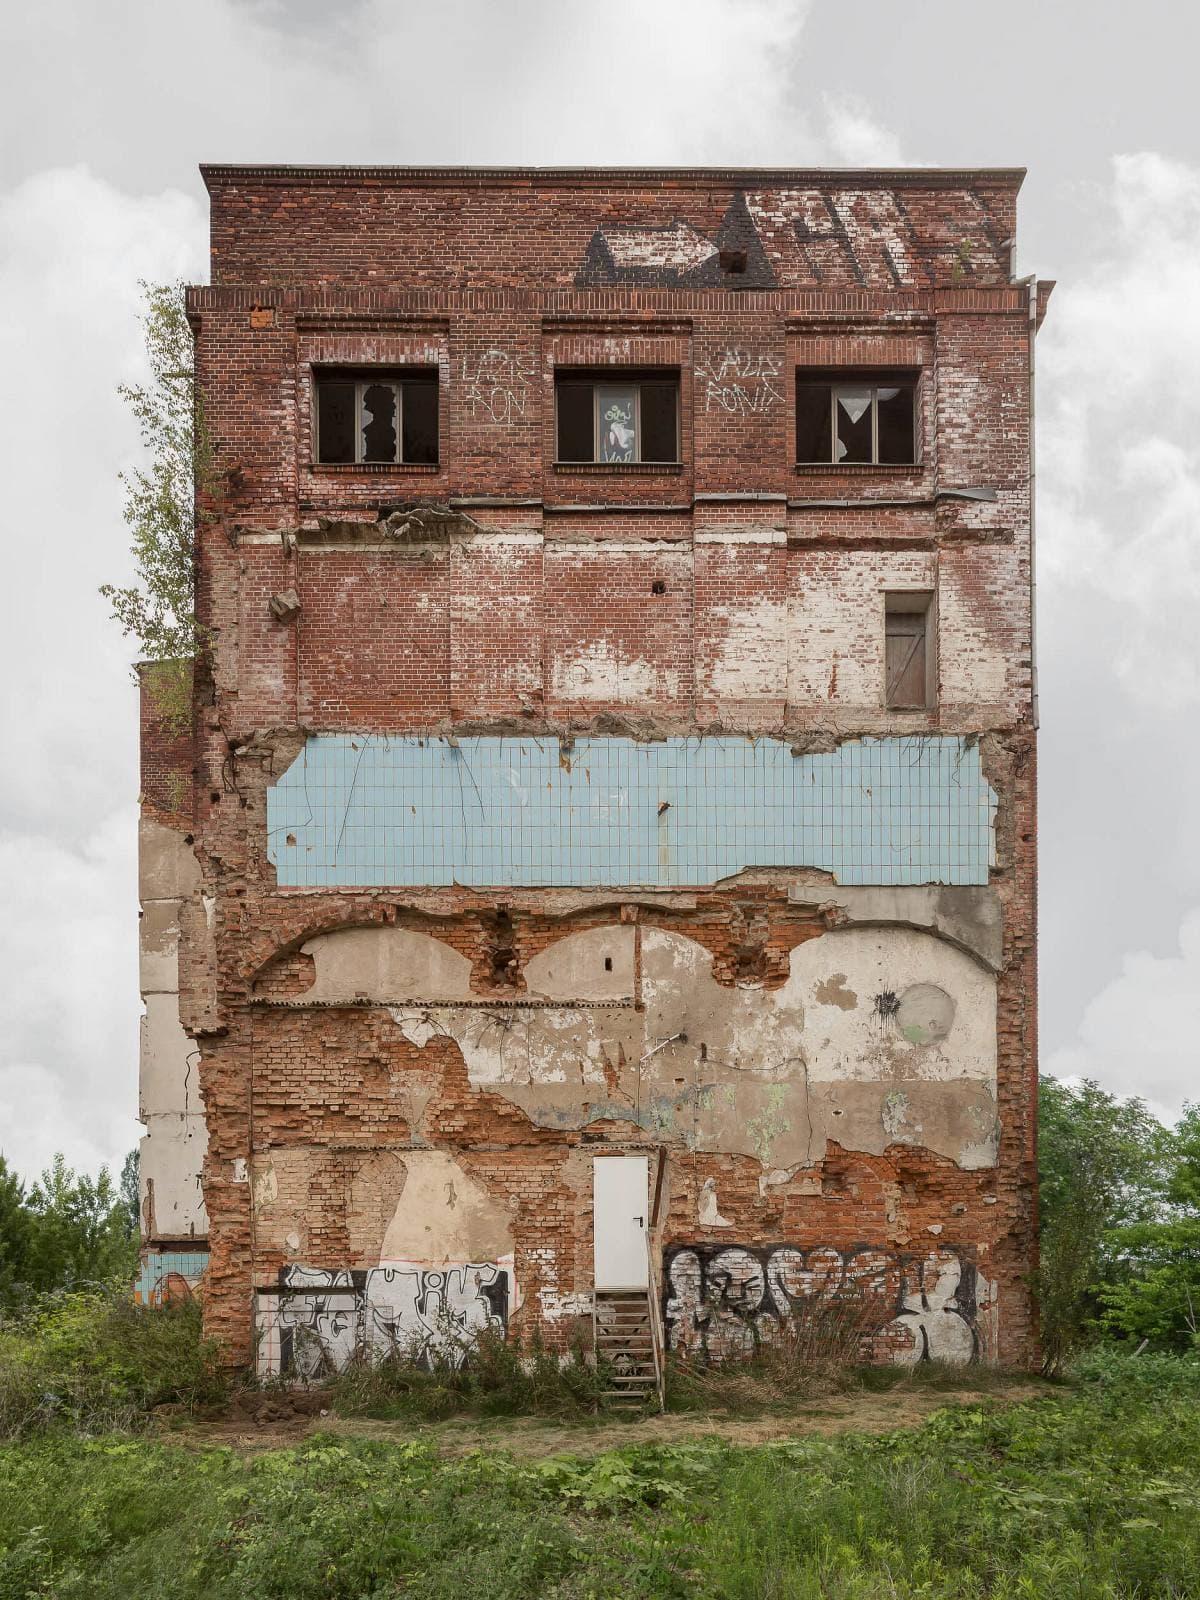 Regentaucher Architekturfotografie | Awaiting Leipzig Swiderski Nord